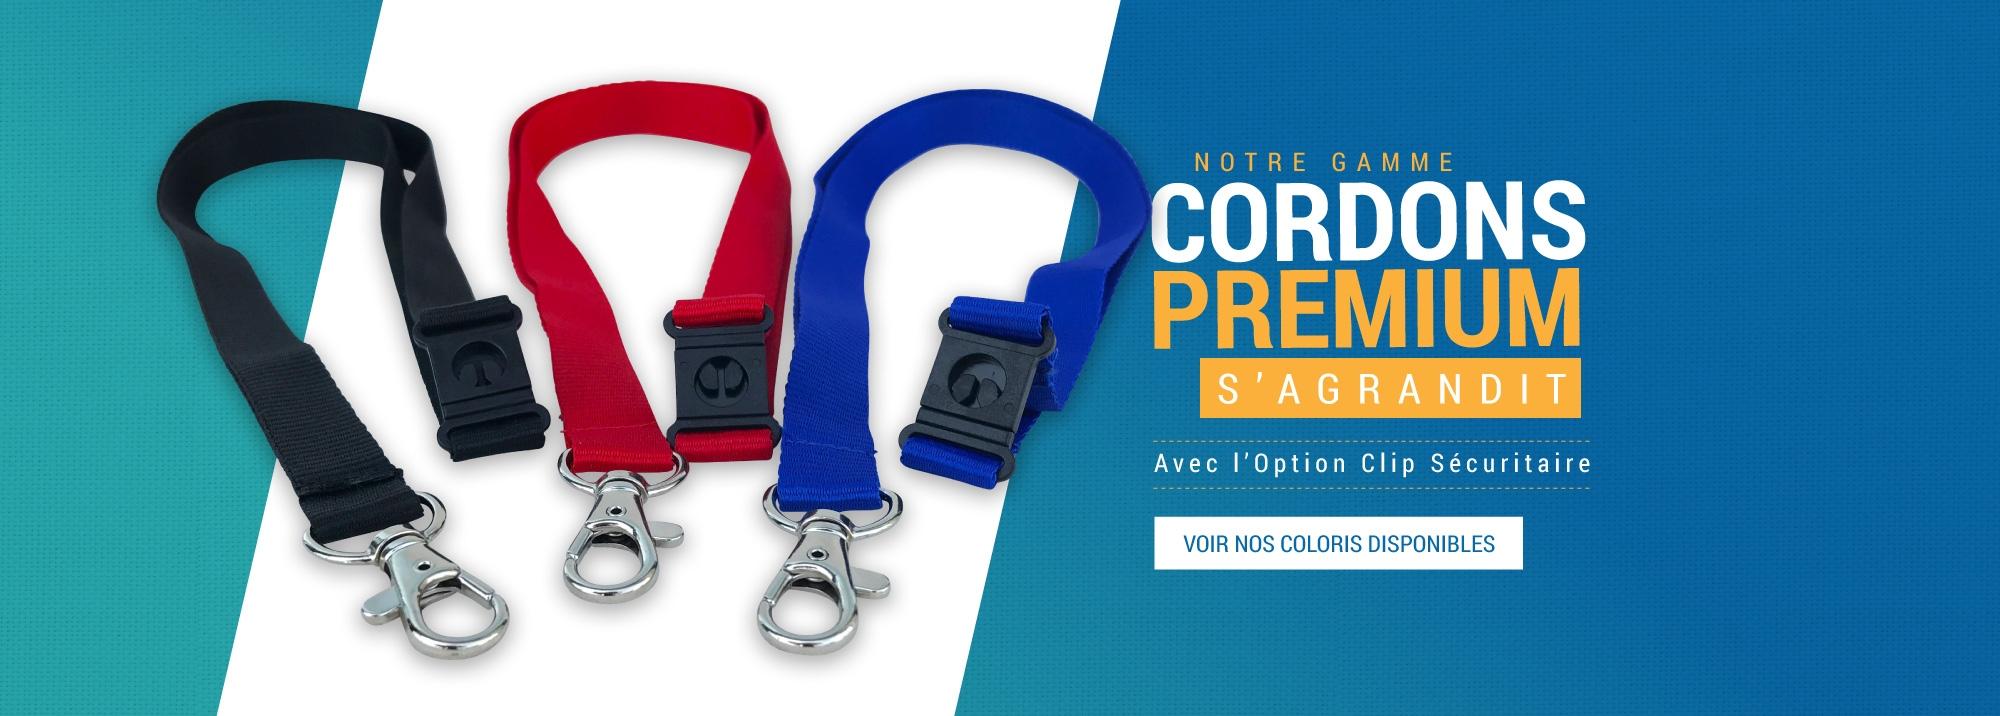 Notre Gamme Cordons Premium s'Agrandit